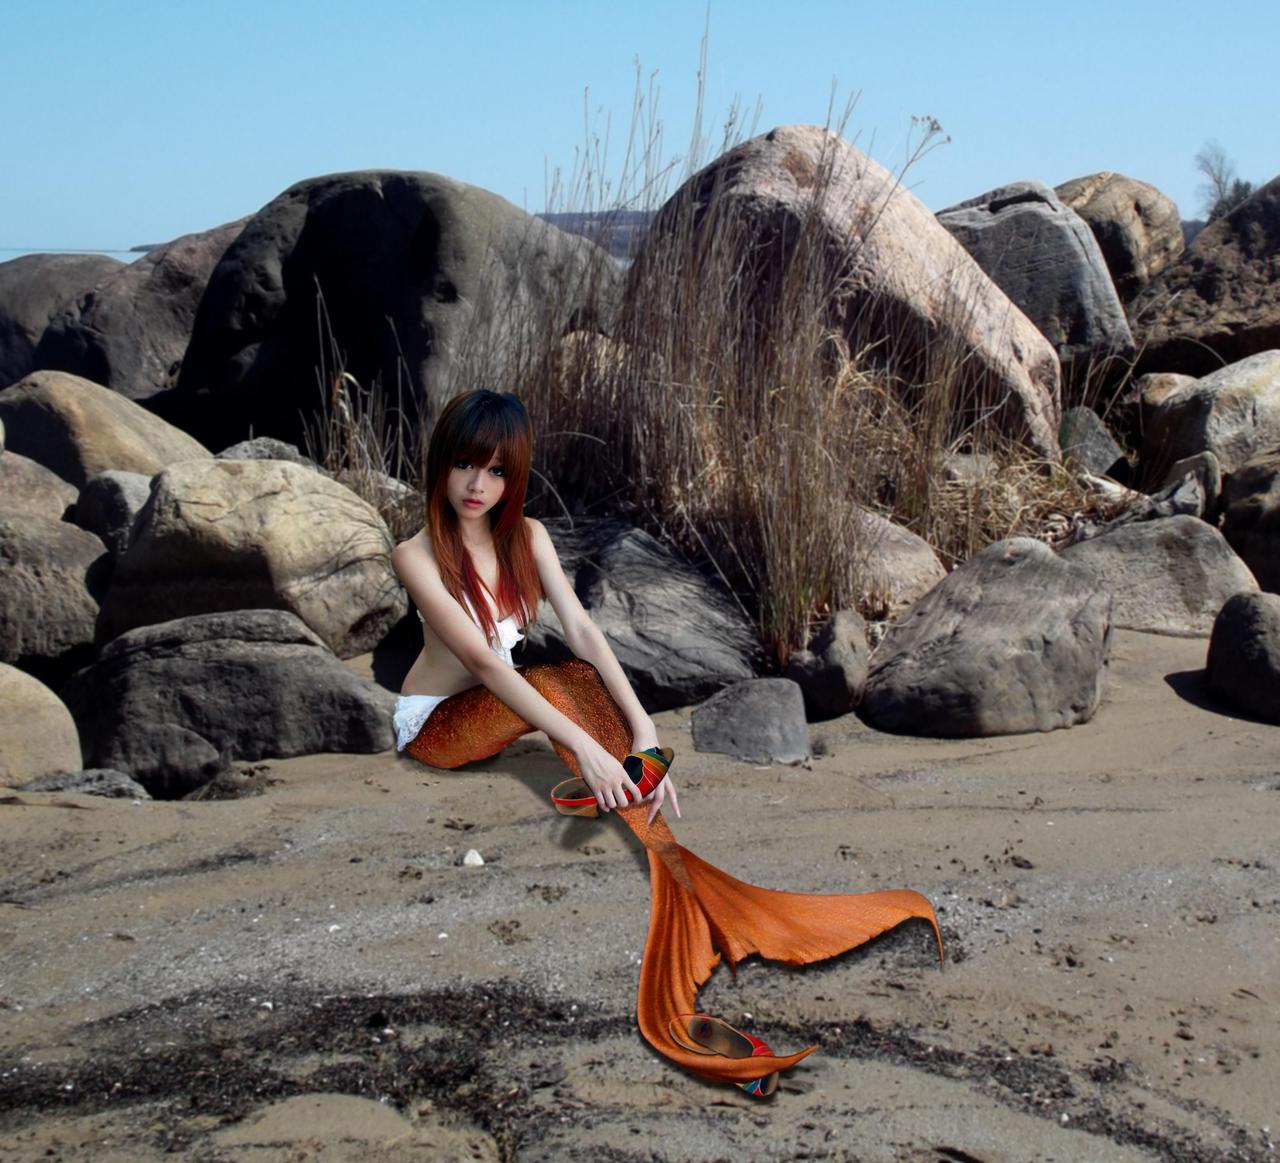 Cinderella Mermaid - where IS that fairygodmother? by sirenabonita